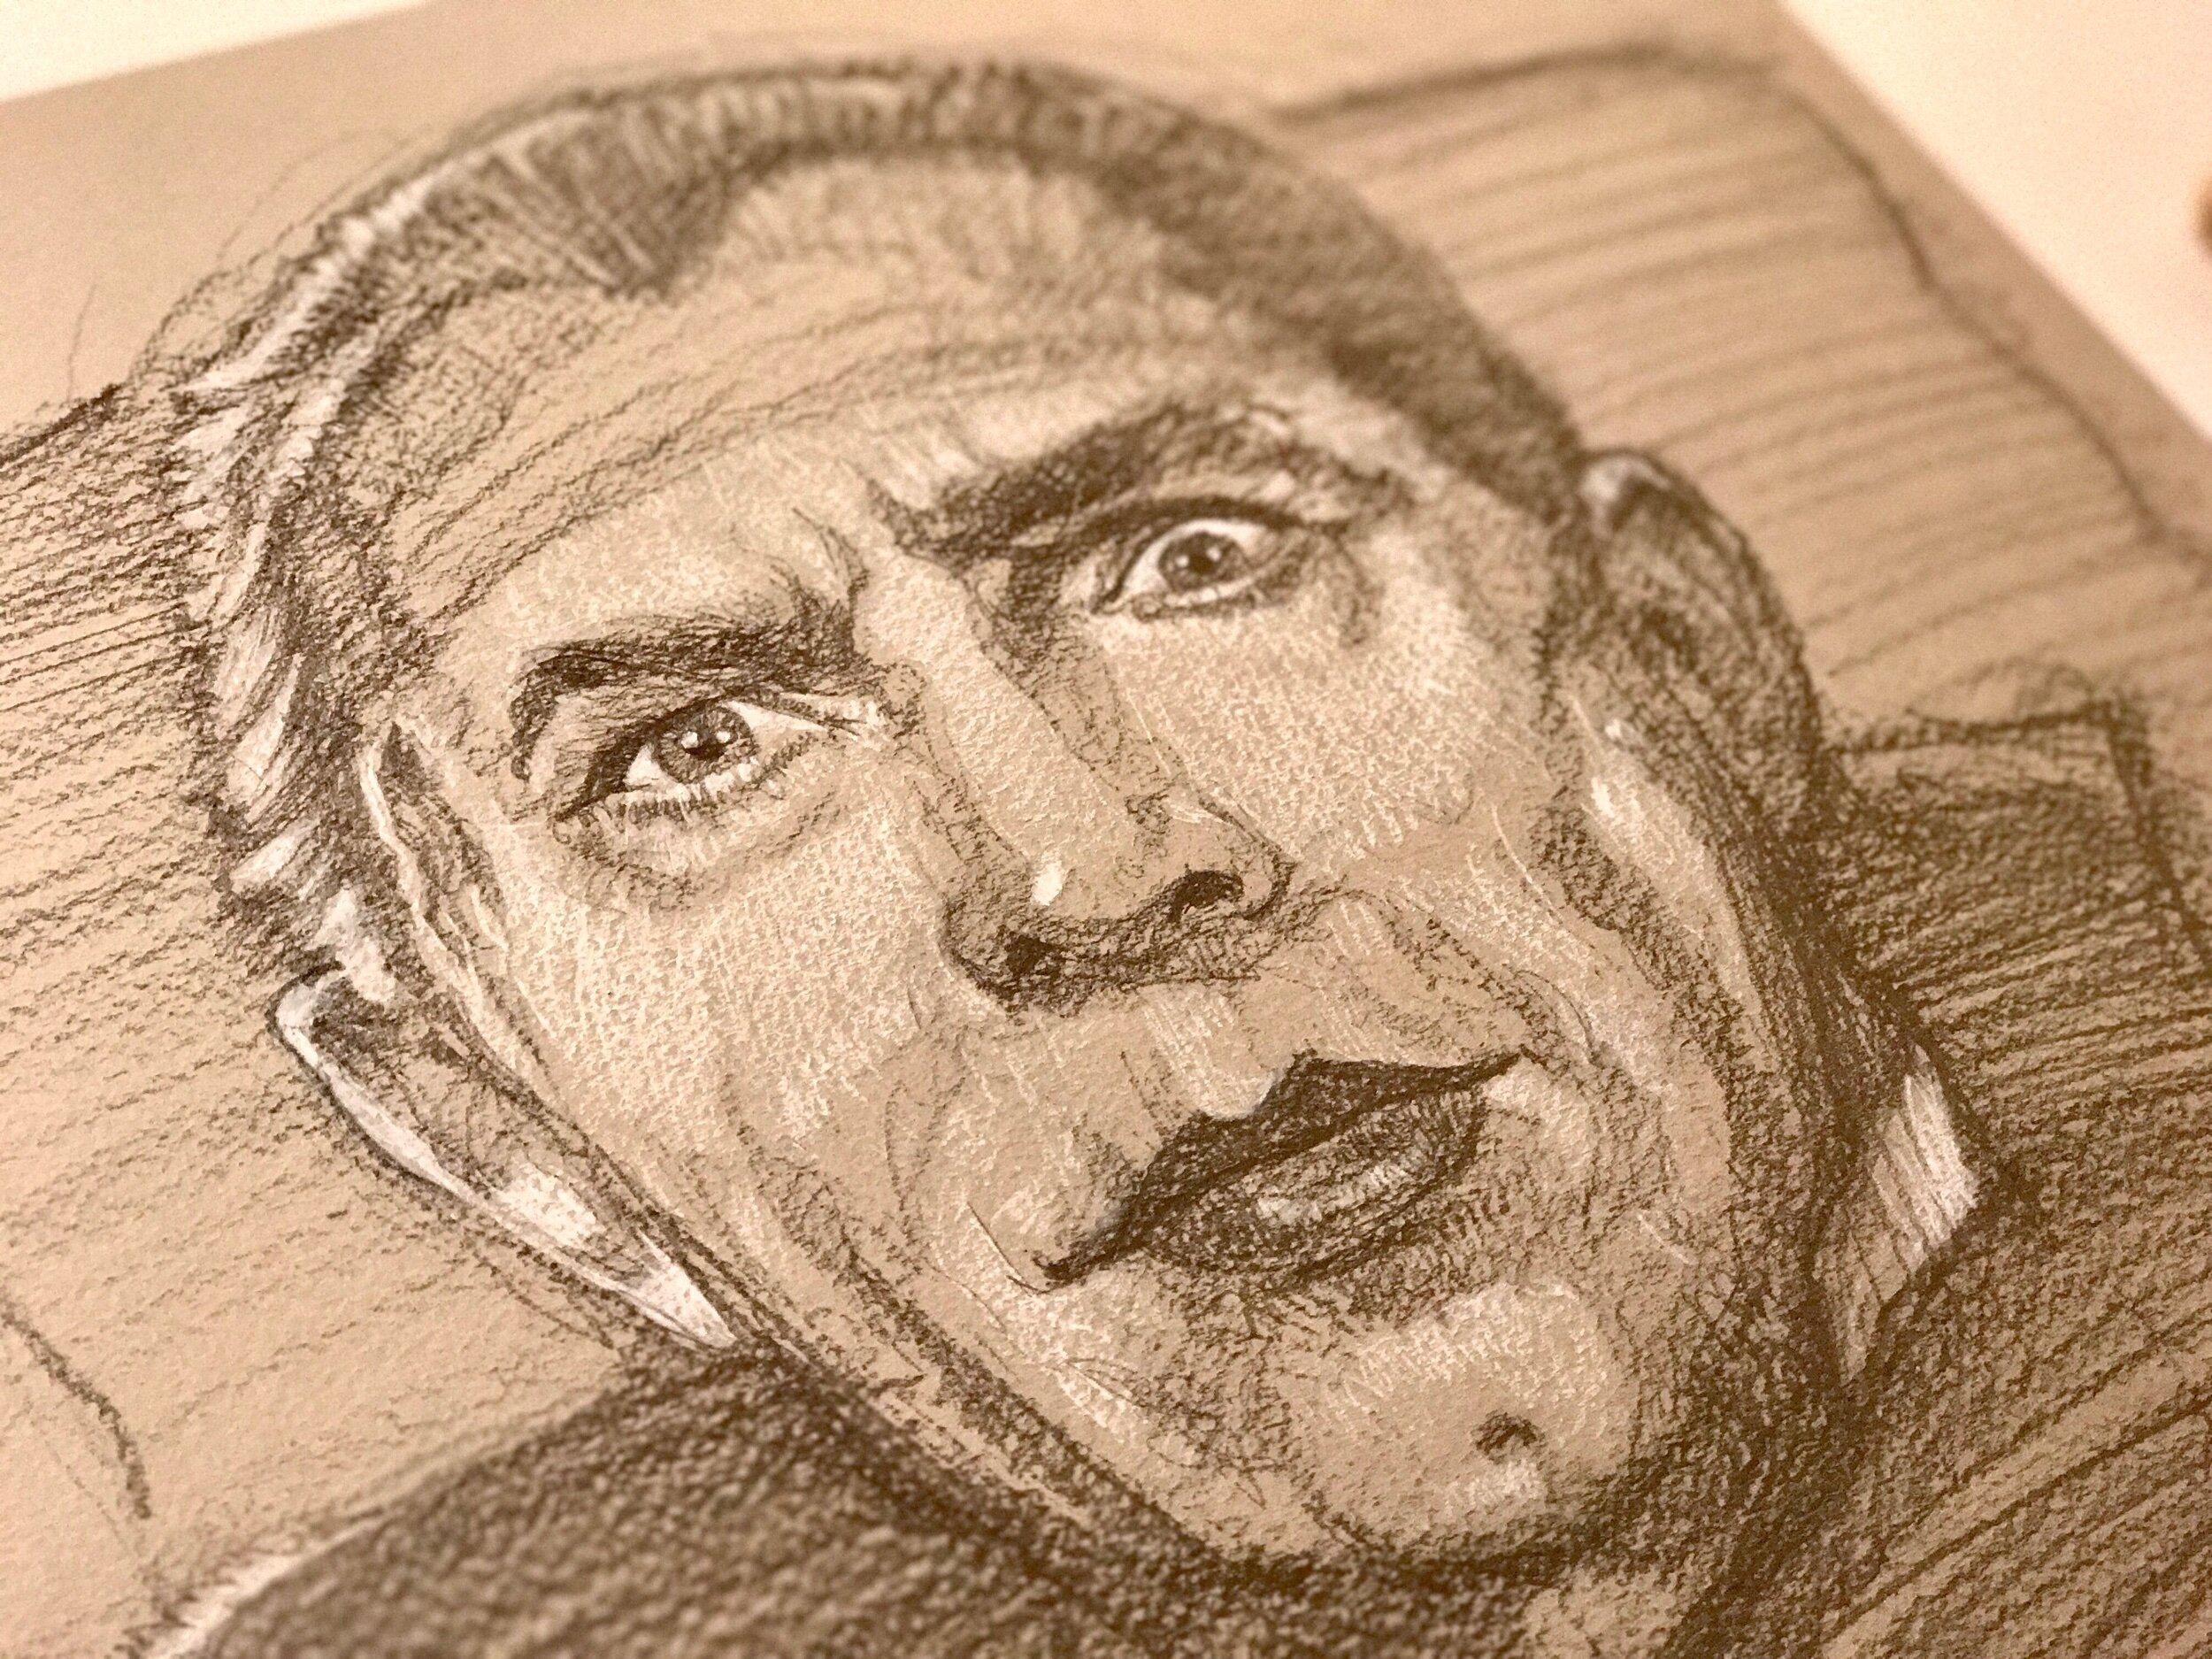 Paul Shipper, 2016 sketch of Bela Lugosi from  Mark of the Vampire  (1935) - closeup image.